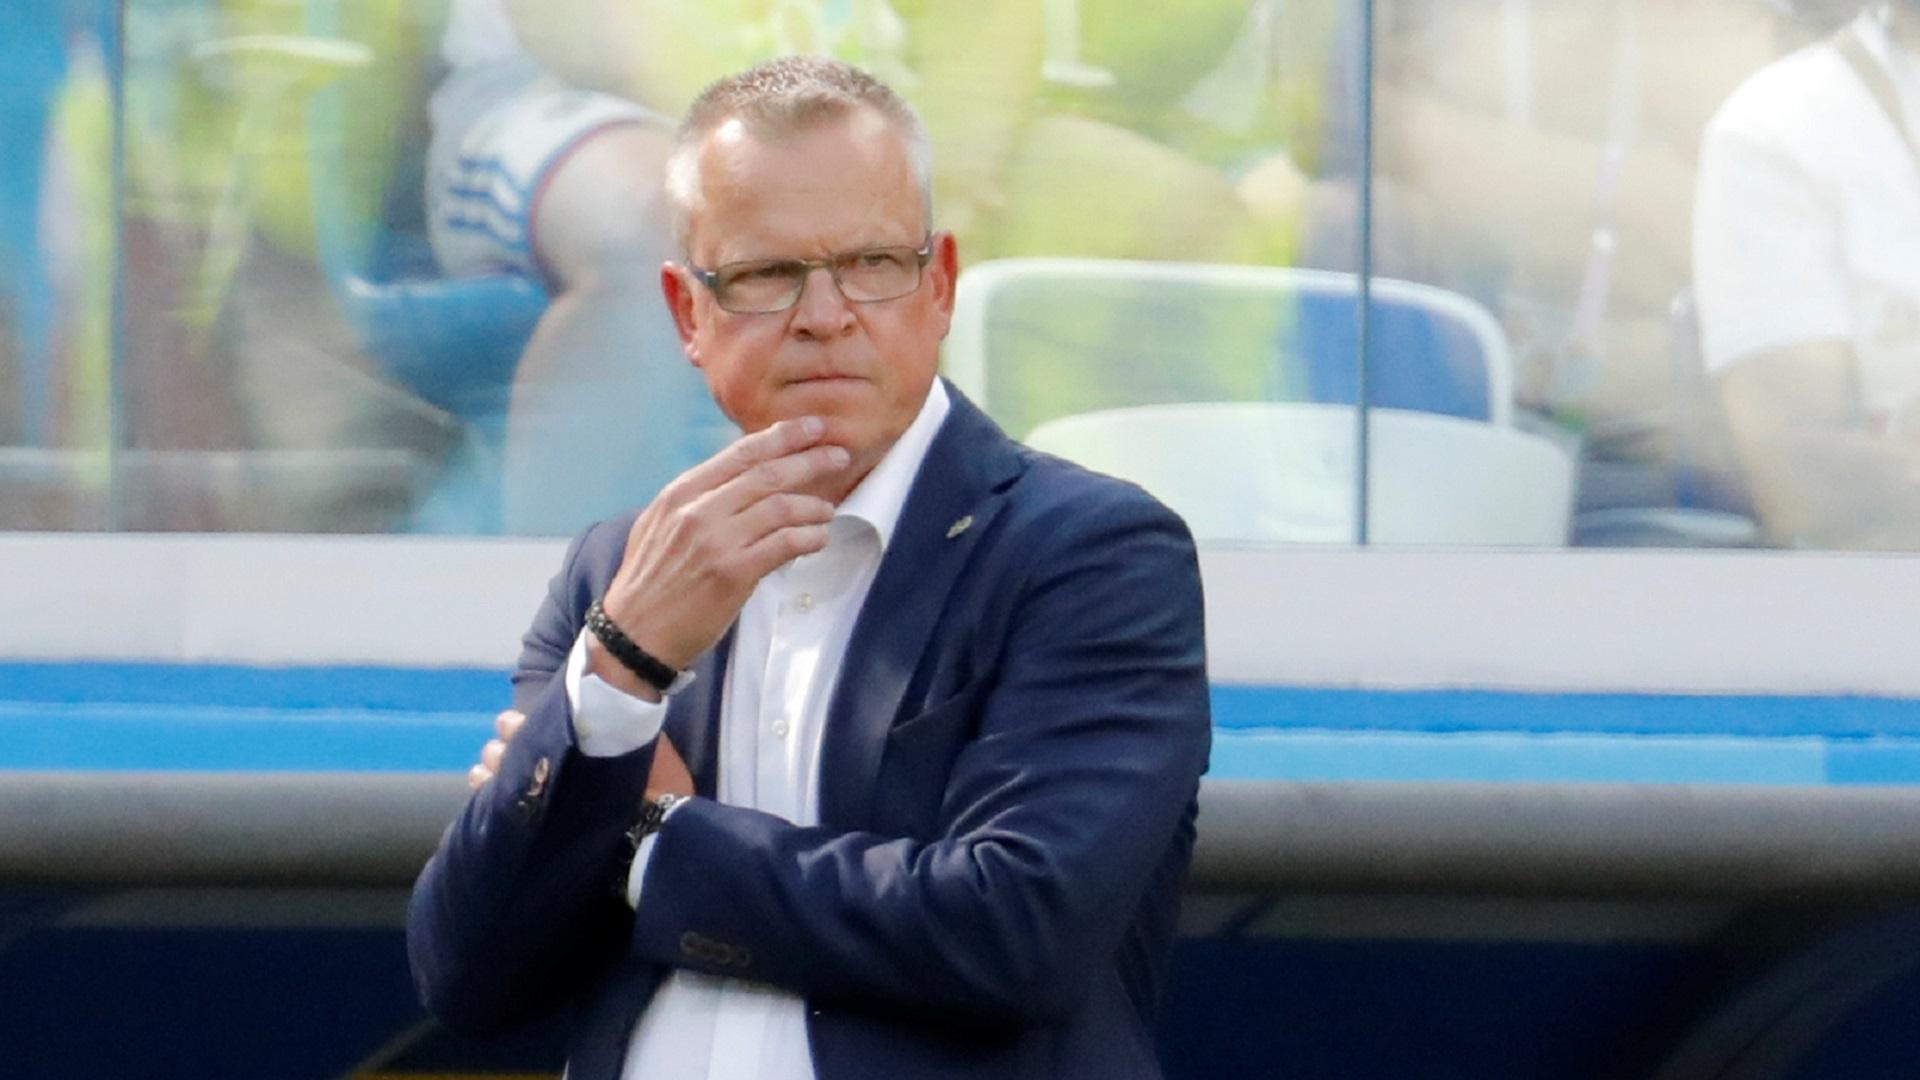 2018-06-19 Janne Andersson Sweden